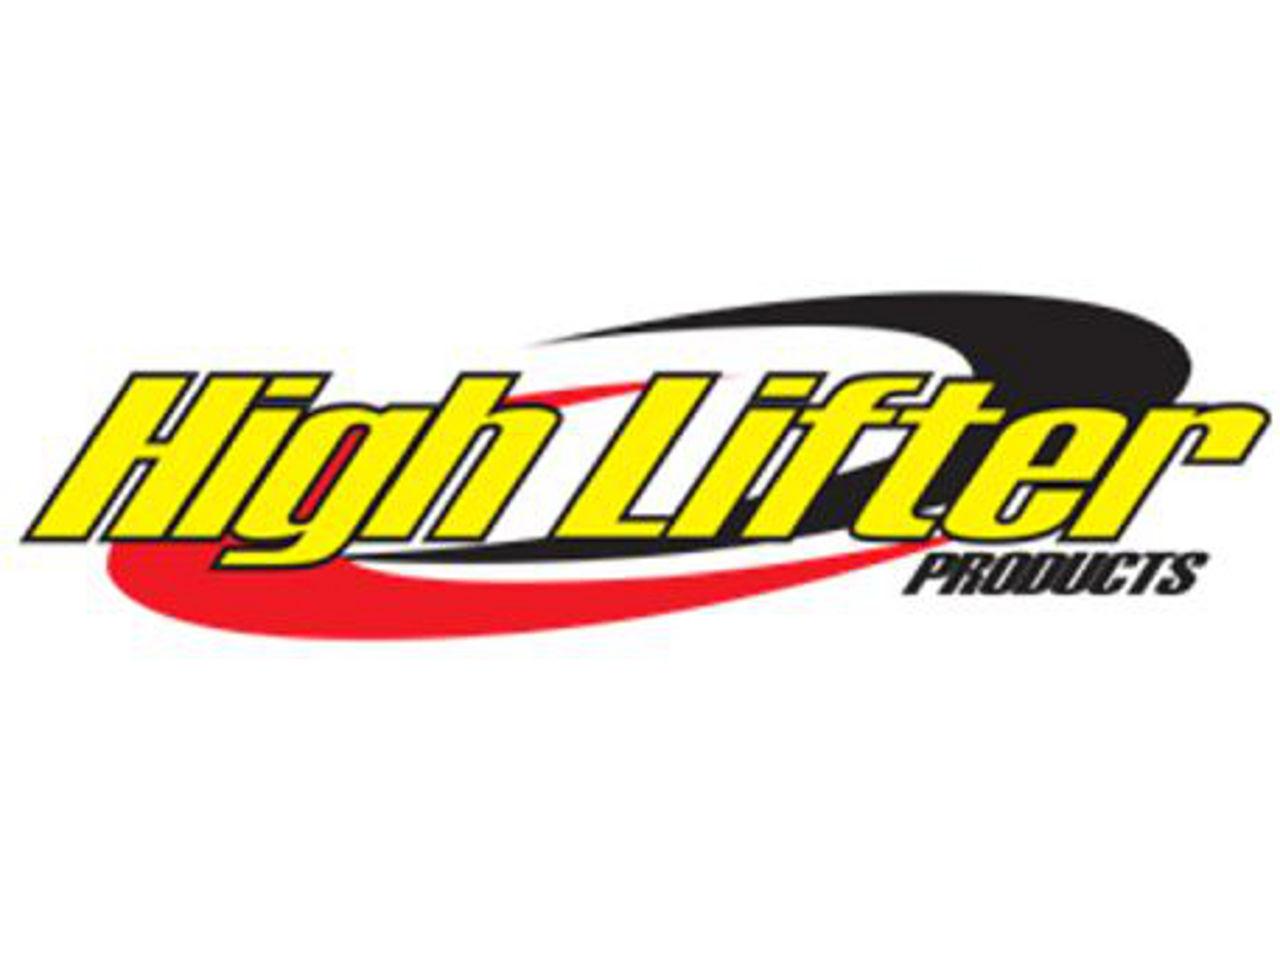 2013 High Lifter Quadna Mud Nationals A Success Event Winners Magnum 325 Wiring Diagram Announced